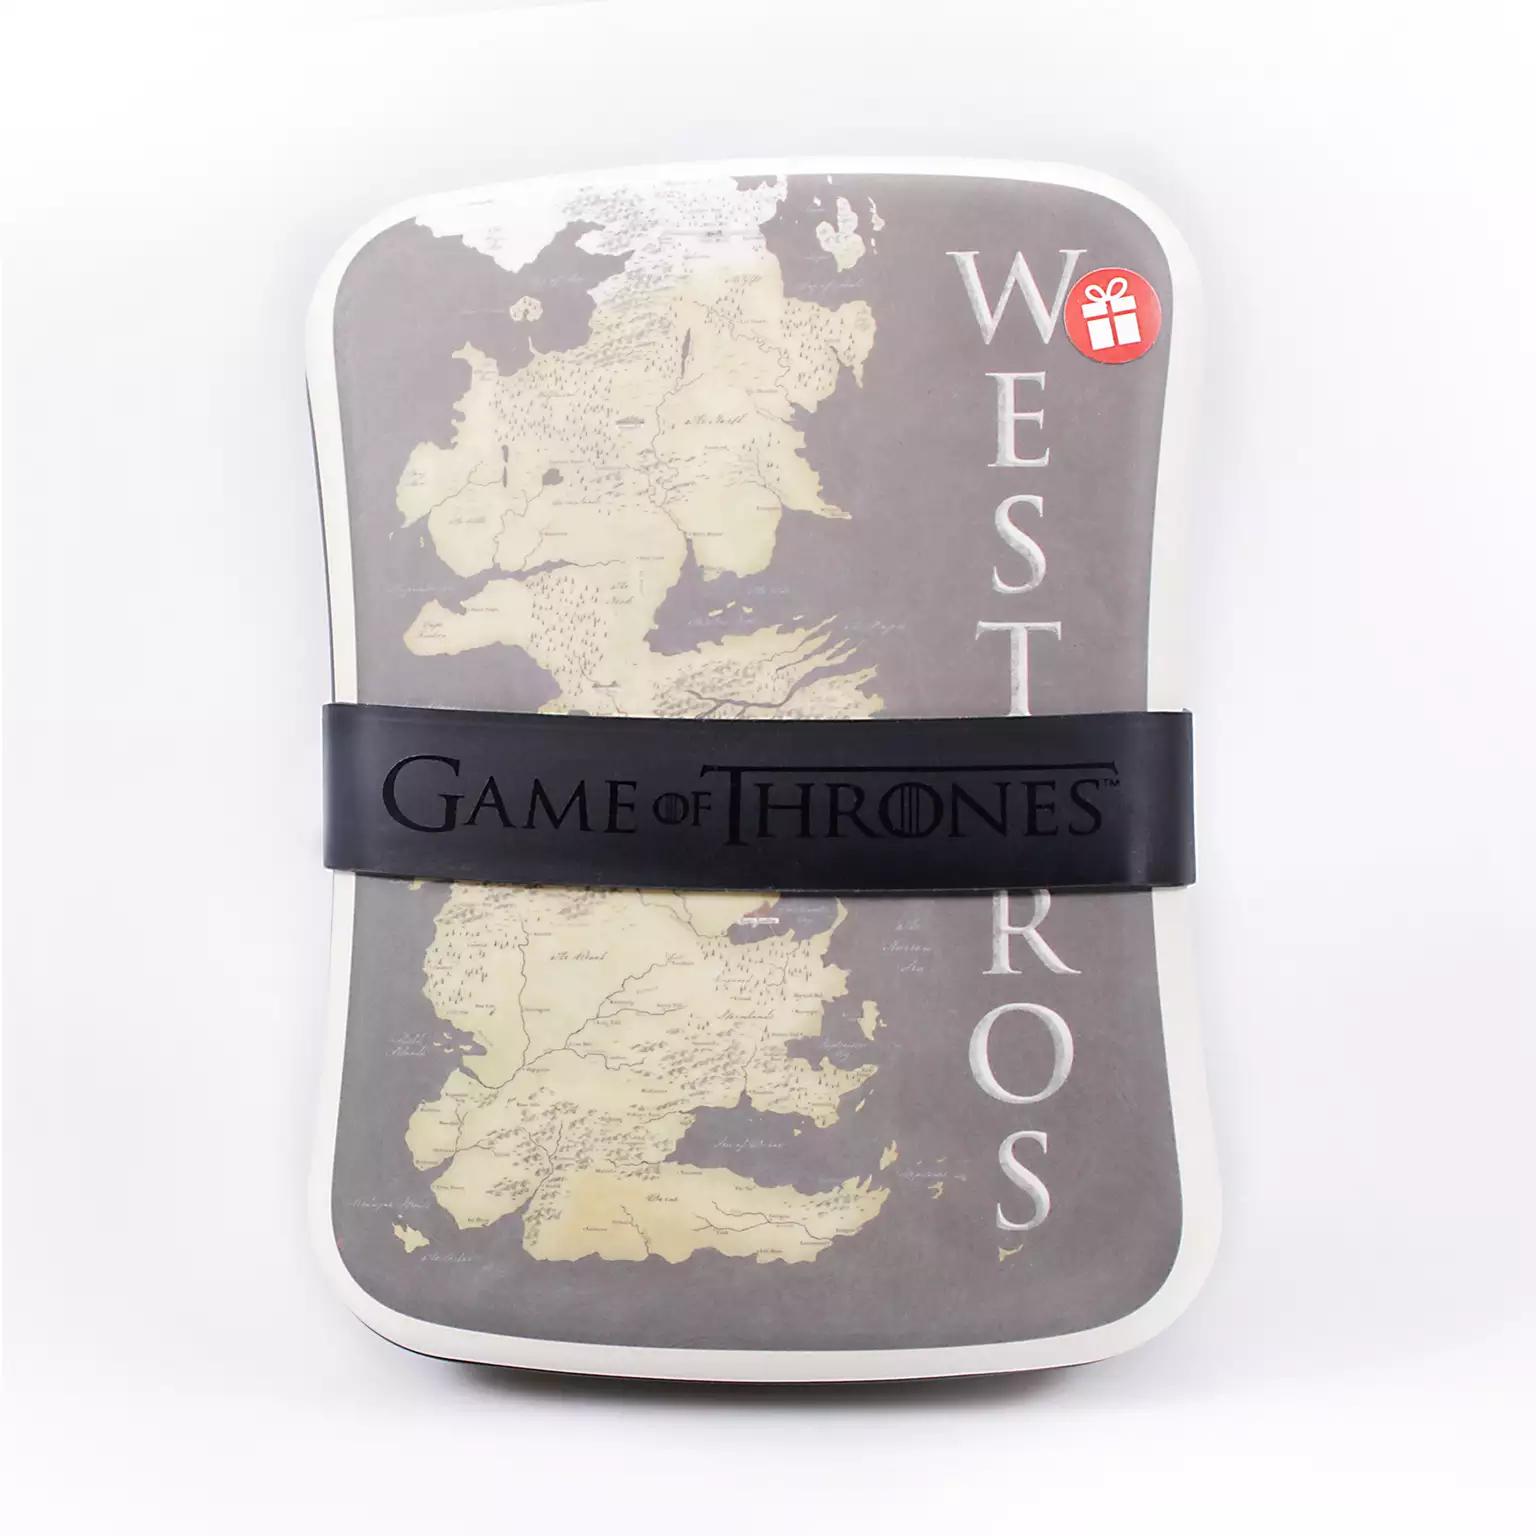 Game of Thrones - Westeros Map Lunch Box £3 @ Debenhams